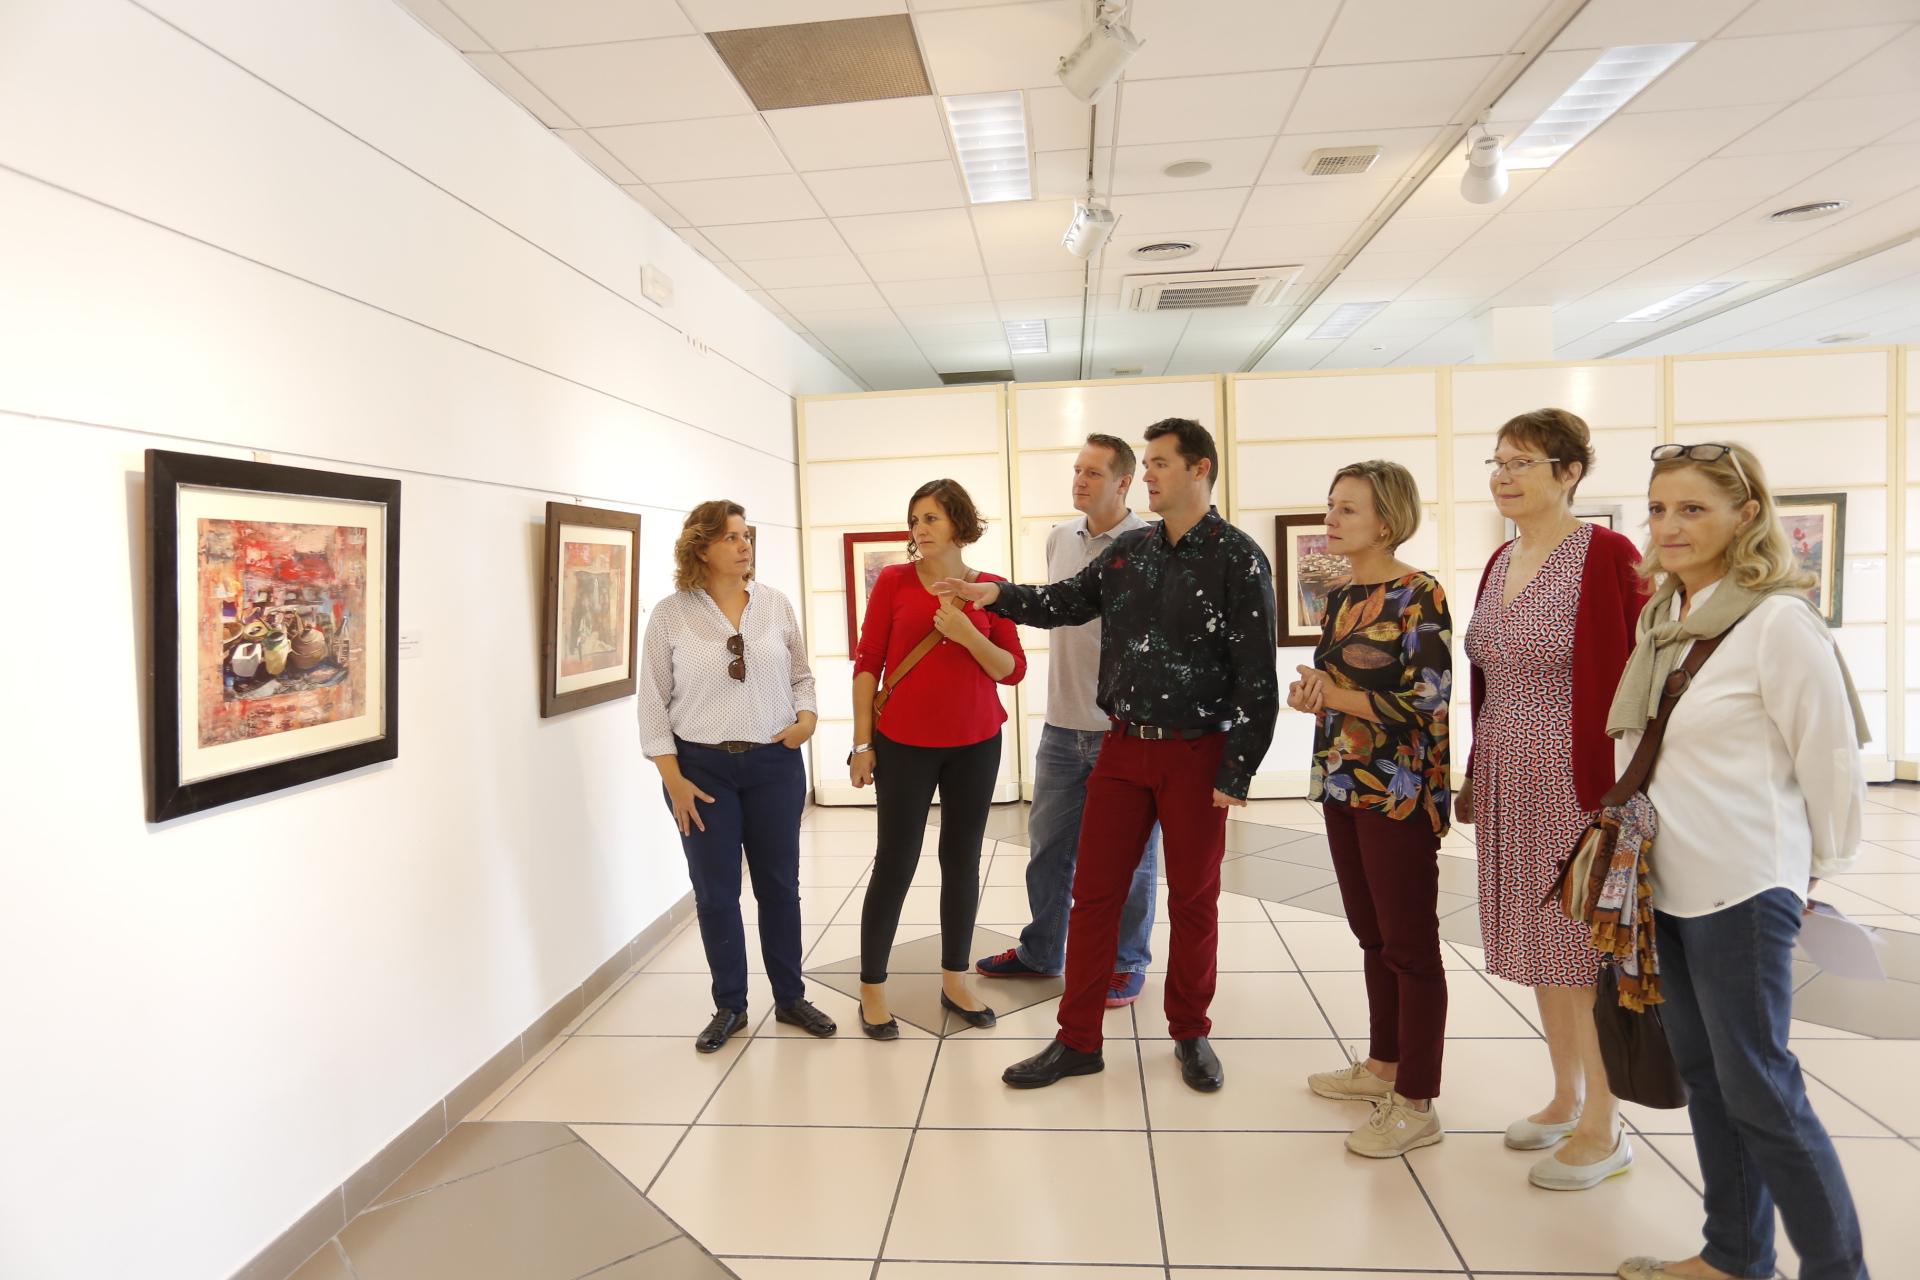 La concejala de l'Alfàs Mayte García junto al pintor Daniel Goering